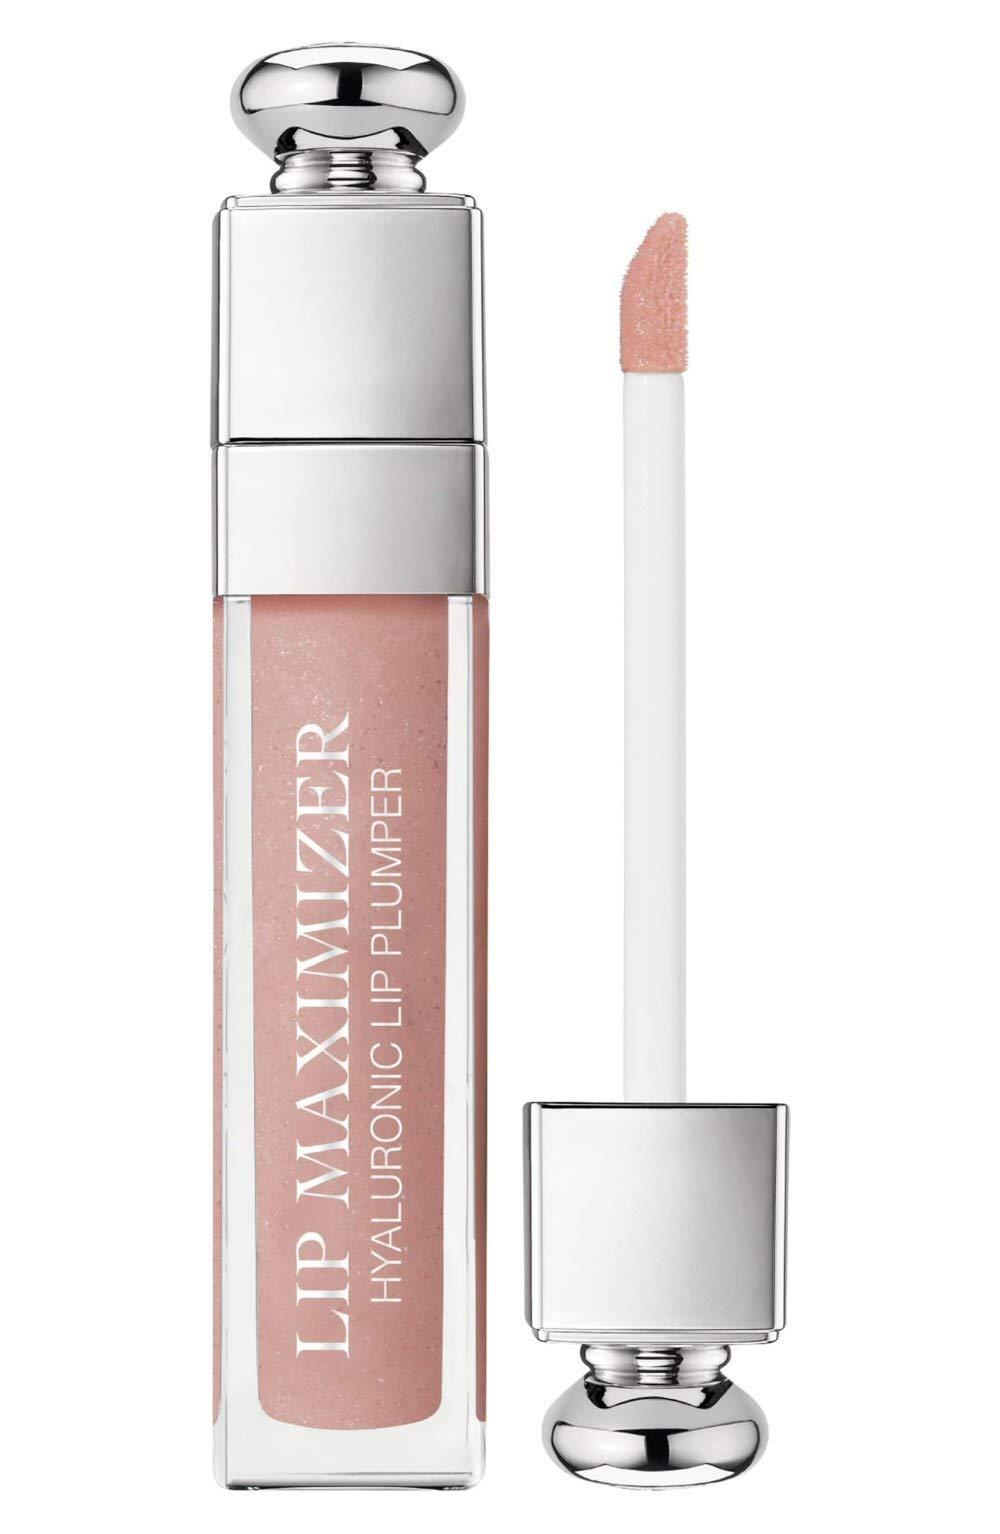 Dior Addict Lip Maximizer - Beige No 013 by Dior